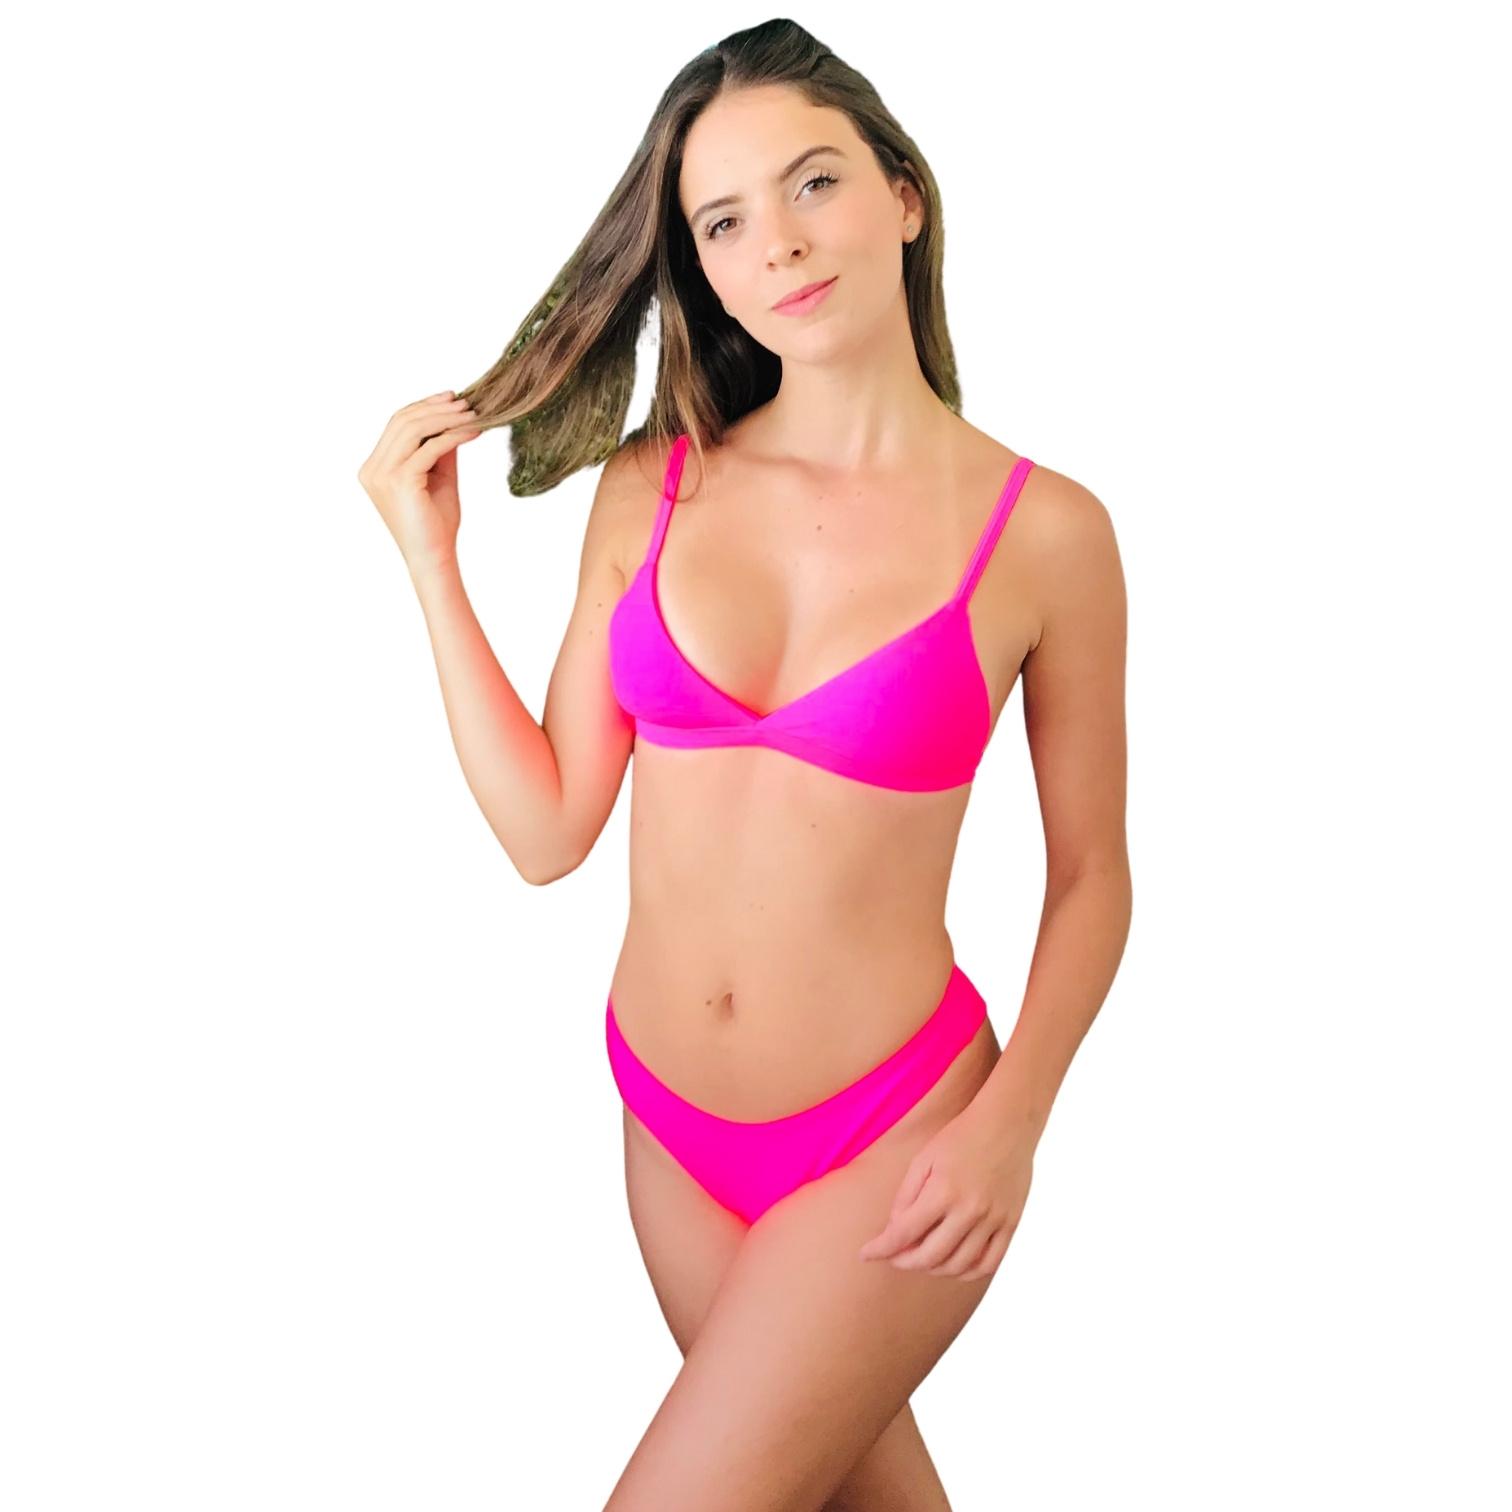 Biquíni Top Fixo com Tanga Asa Delta Fio Duplo Pink Neon